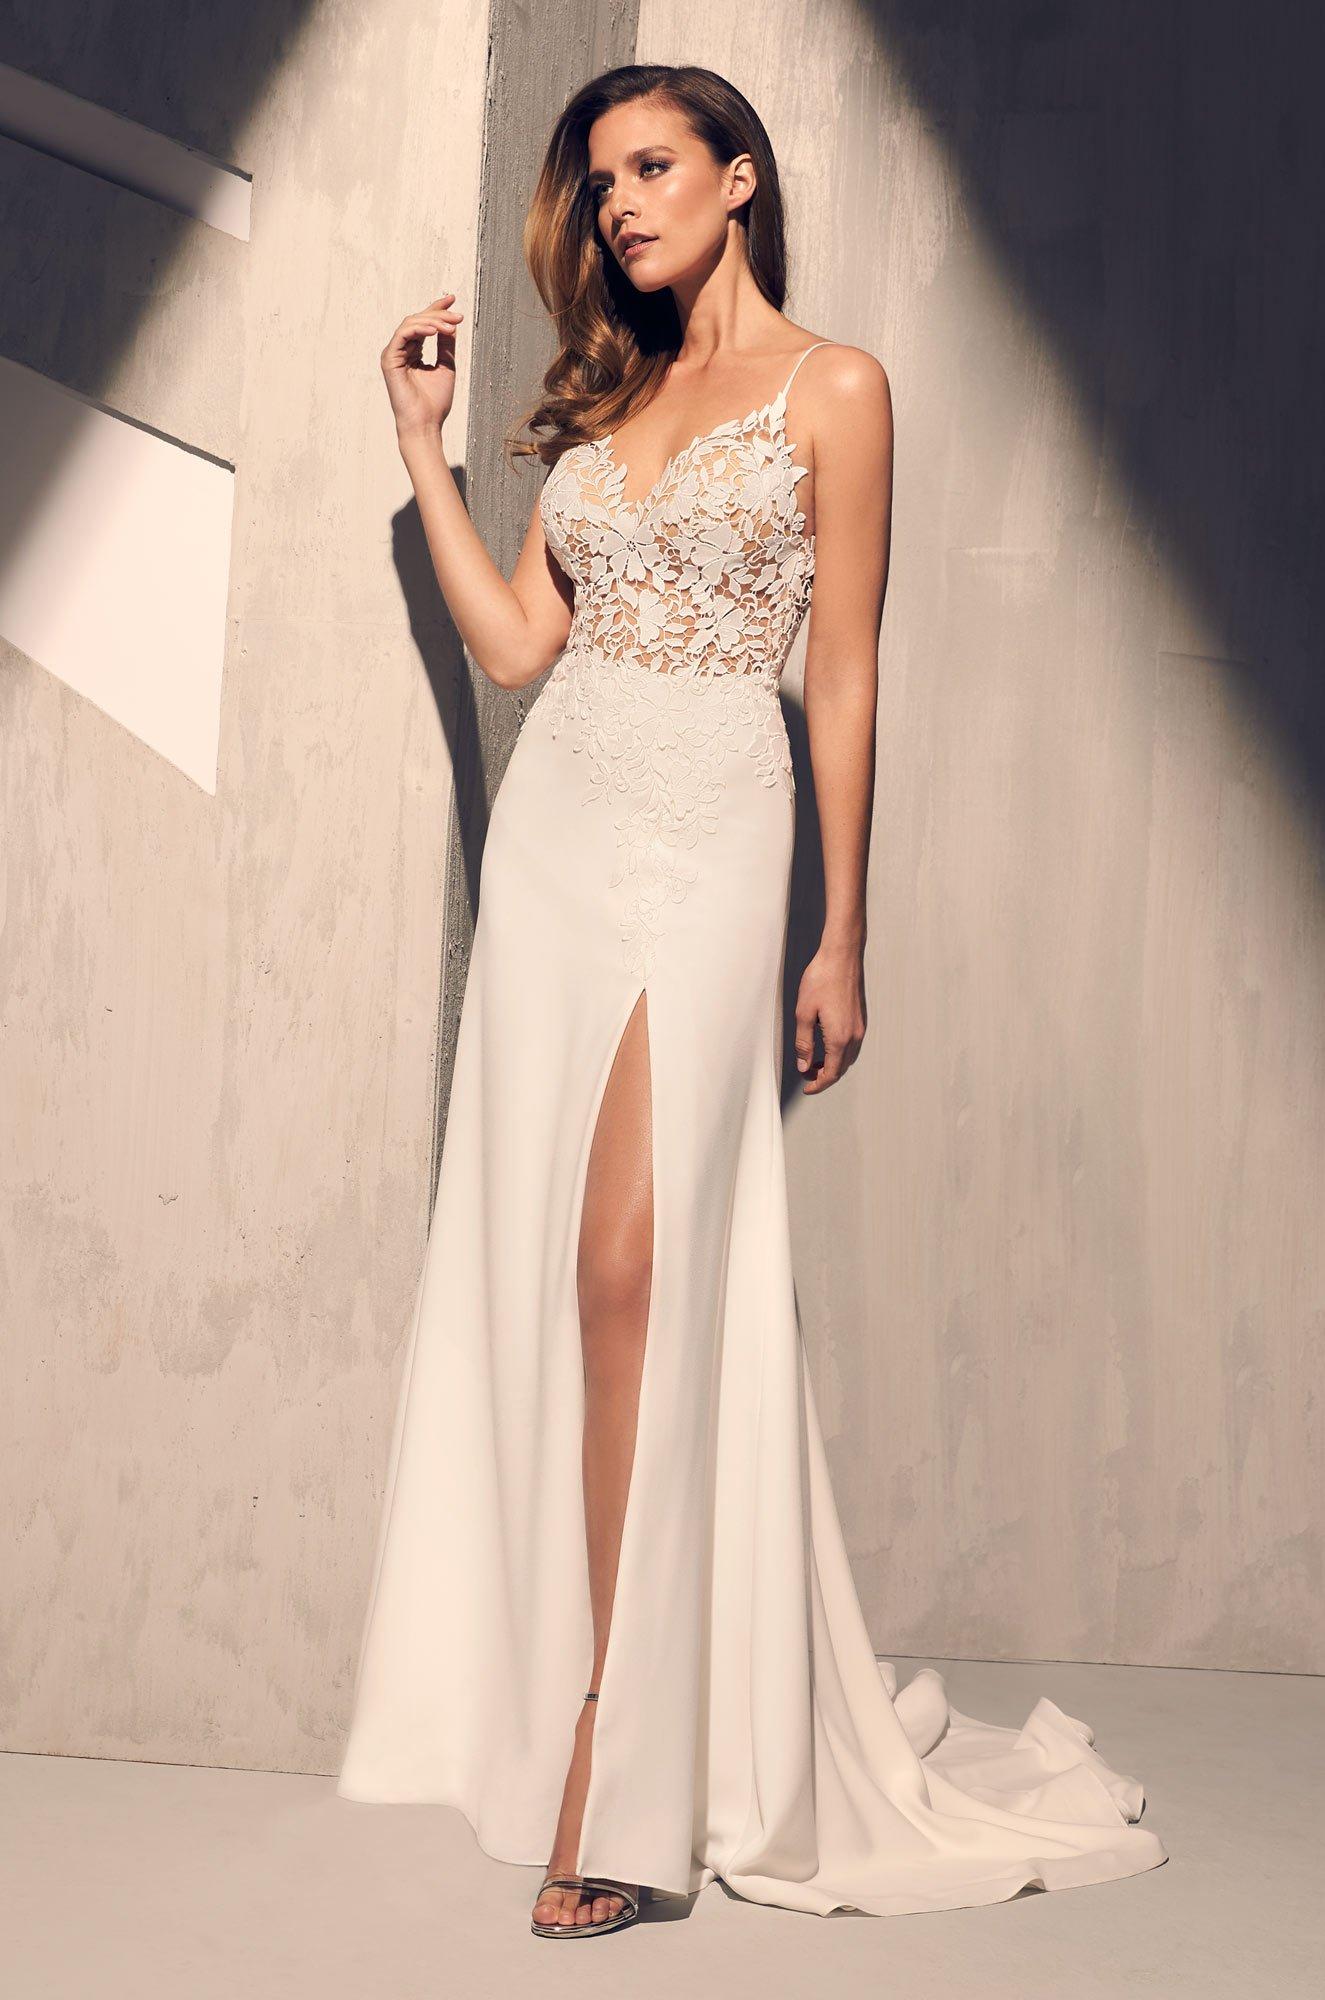 Sheer Floral Bodice Wedding Dress - Style #2208 | Mikaella Bridal